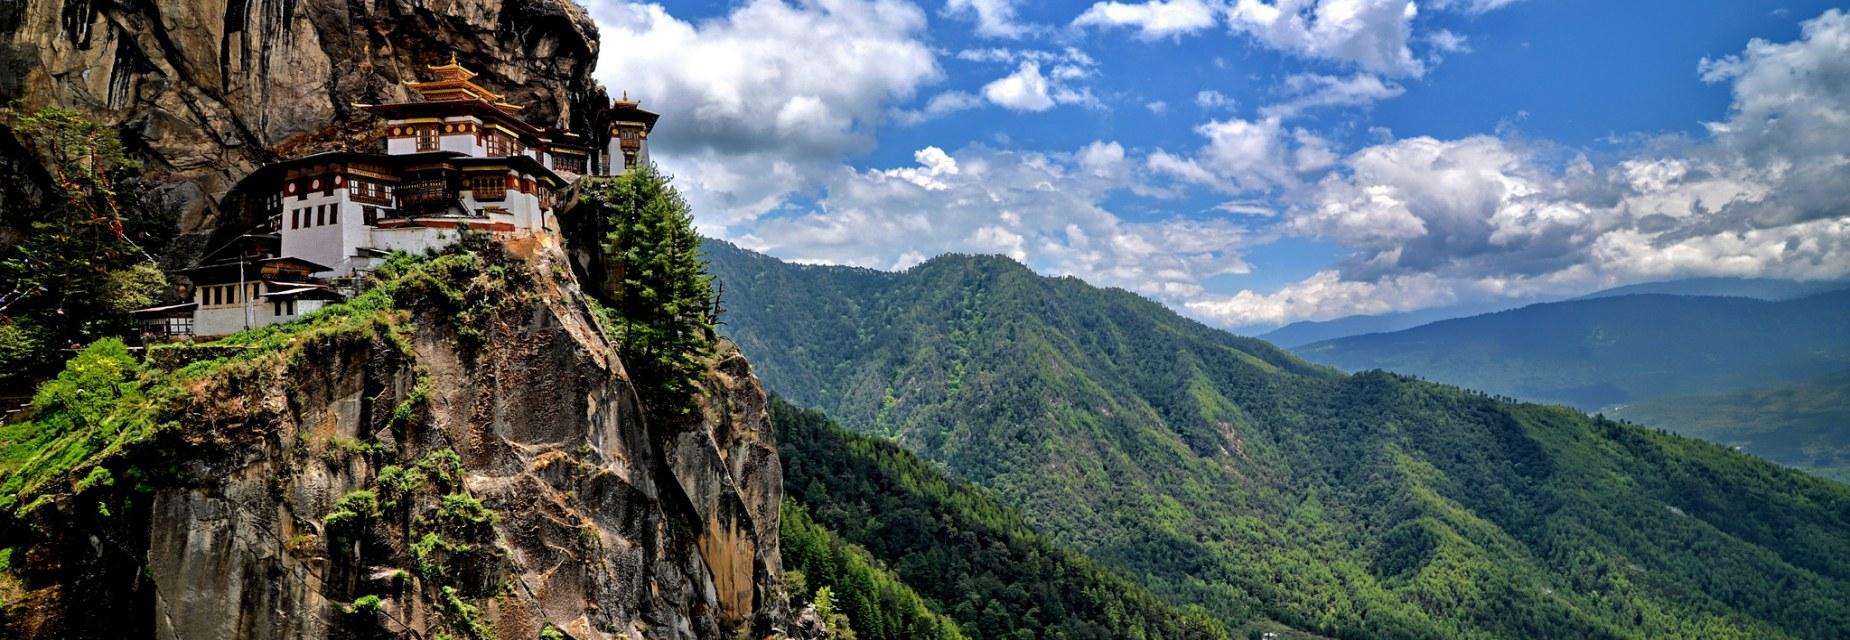 bhutan-monastery-taktshang-secret-world